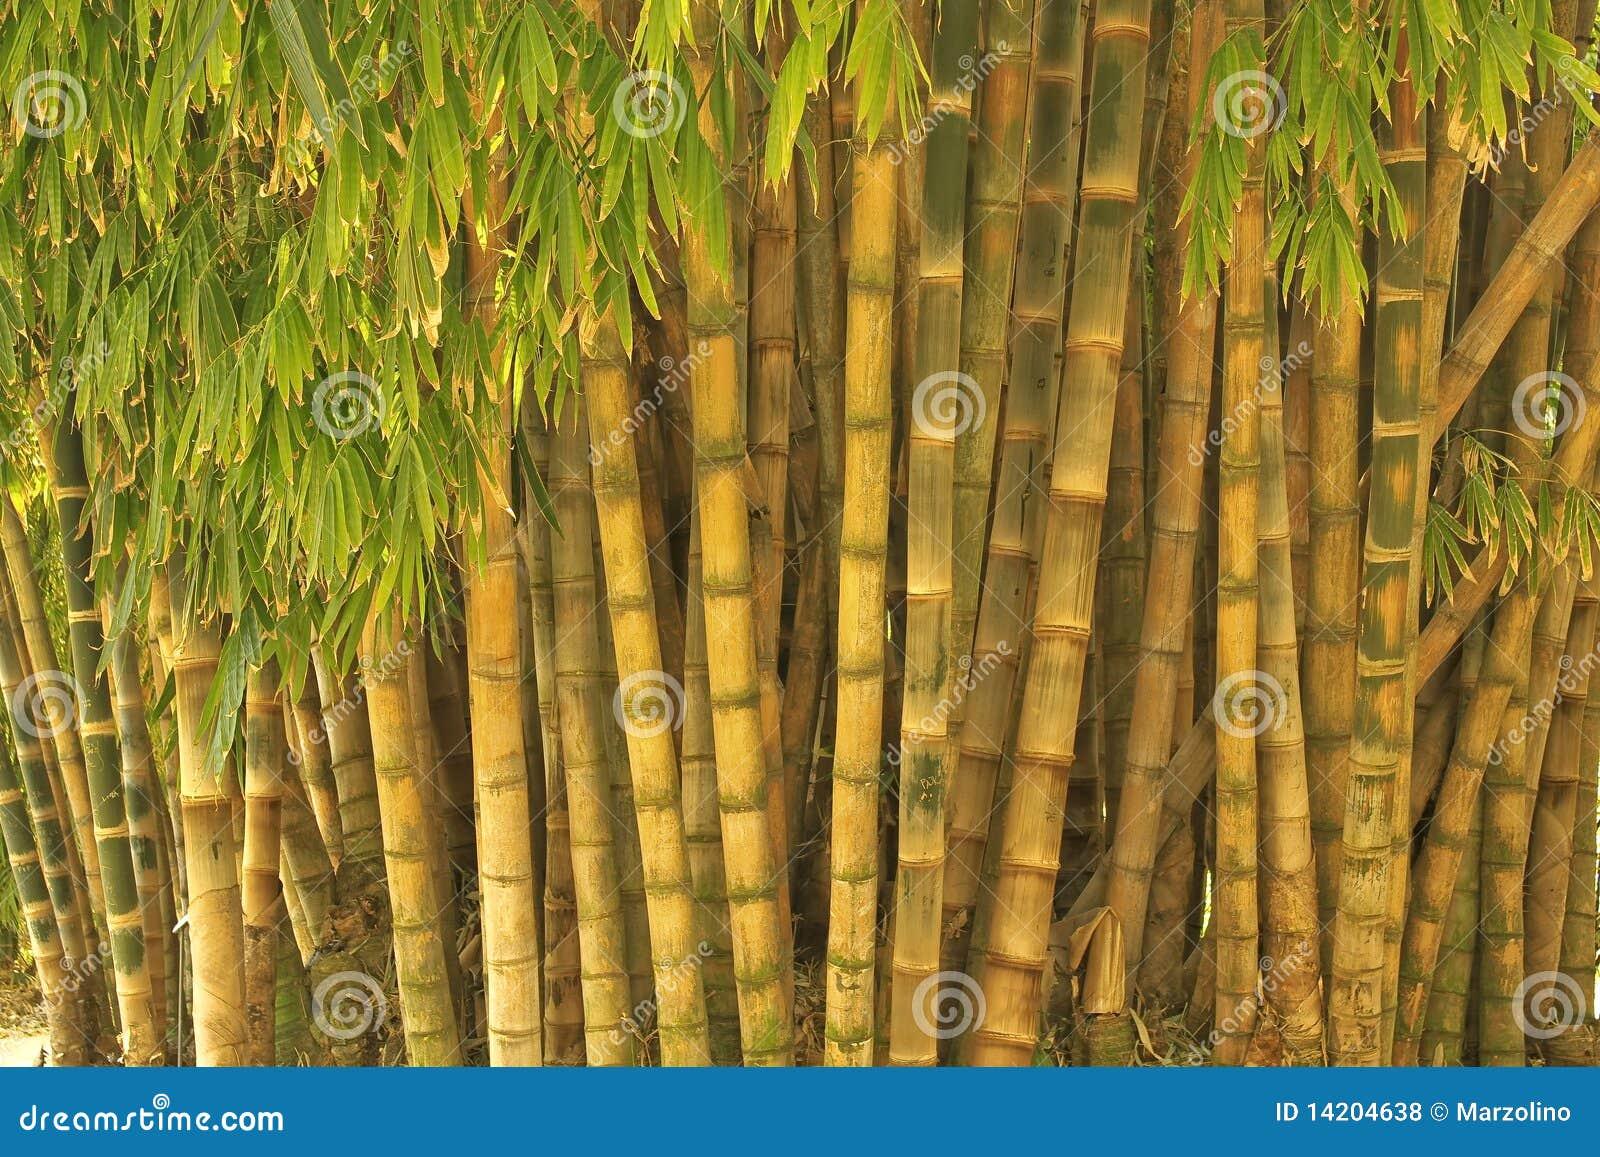 gro er bambus lizenzfreie stockfotos bild 14204638. Black Bedroom Furniture Sets. Home Design Ideas